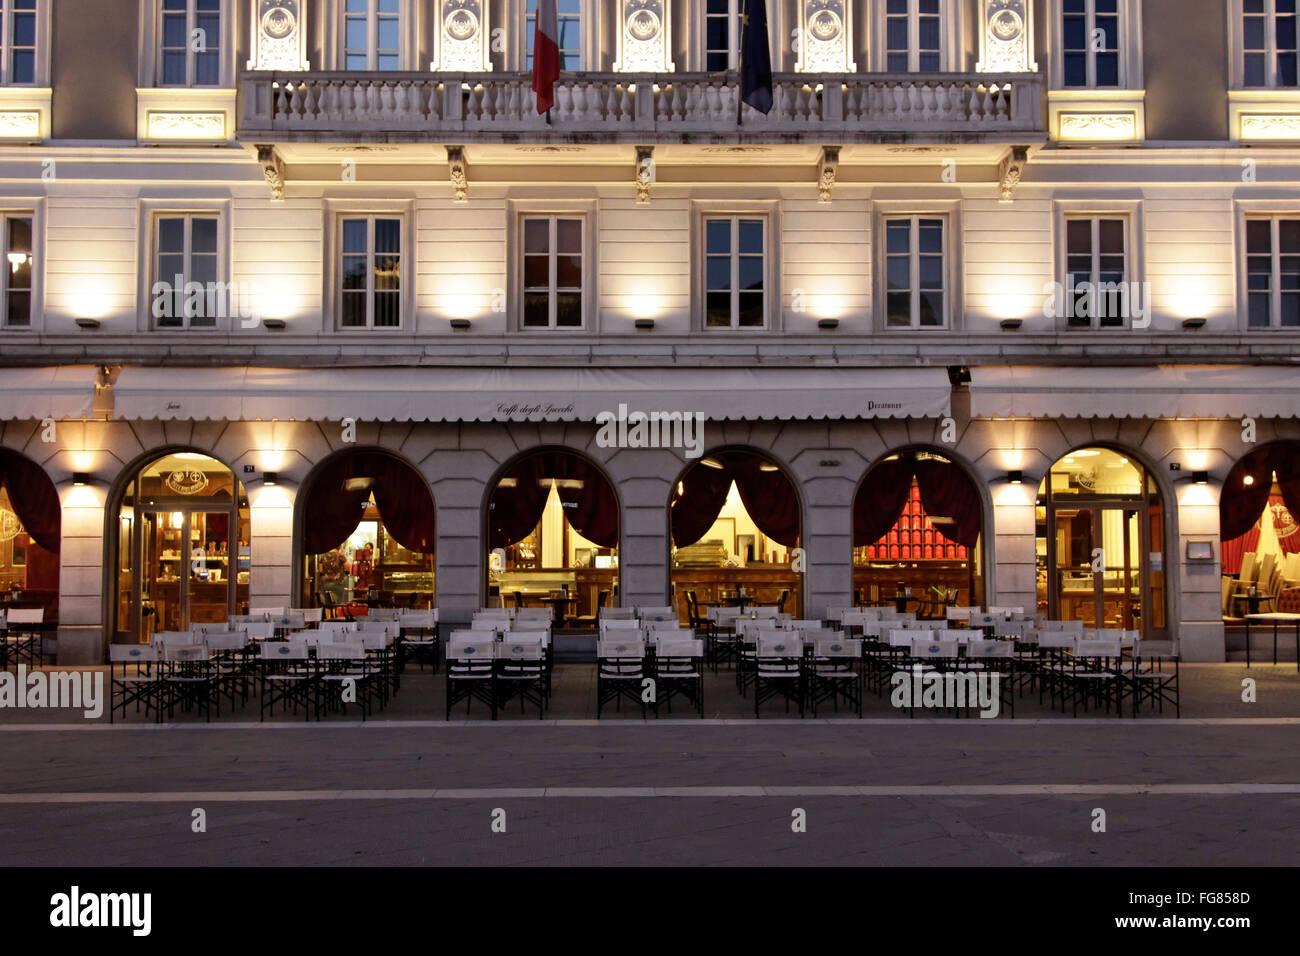 geography / travel, Italy, Trieste, Casa Stratti with Cafe degli Specchi, Piazza Unita, Additional-Rights-Clearance - Stock Image